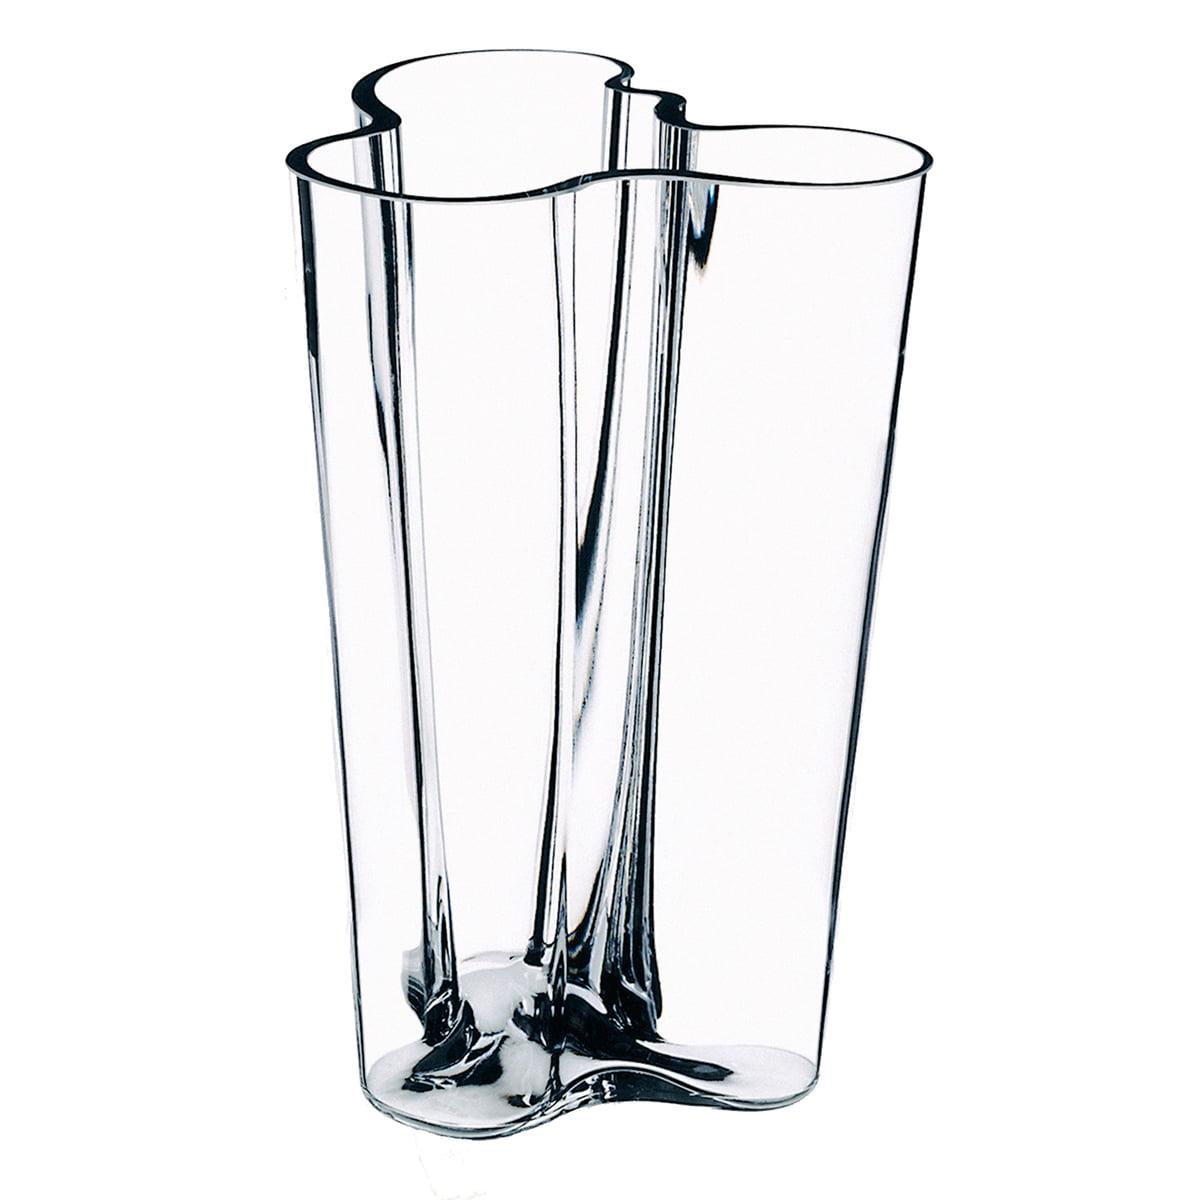 Aalto vase finlandia by iittala in the shop aalto finlandia vase by iittala made from clear glass reviewsmspy